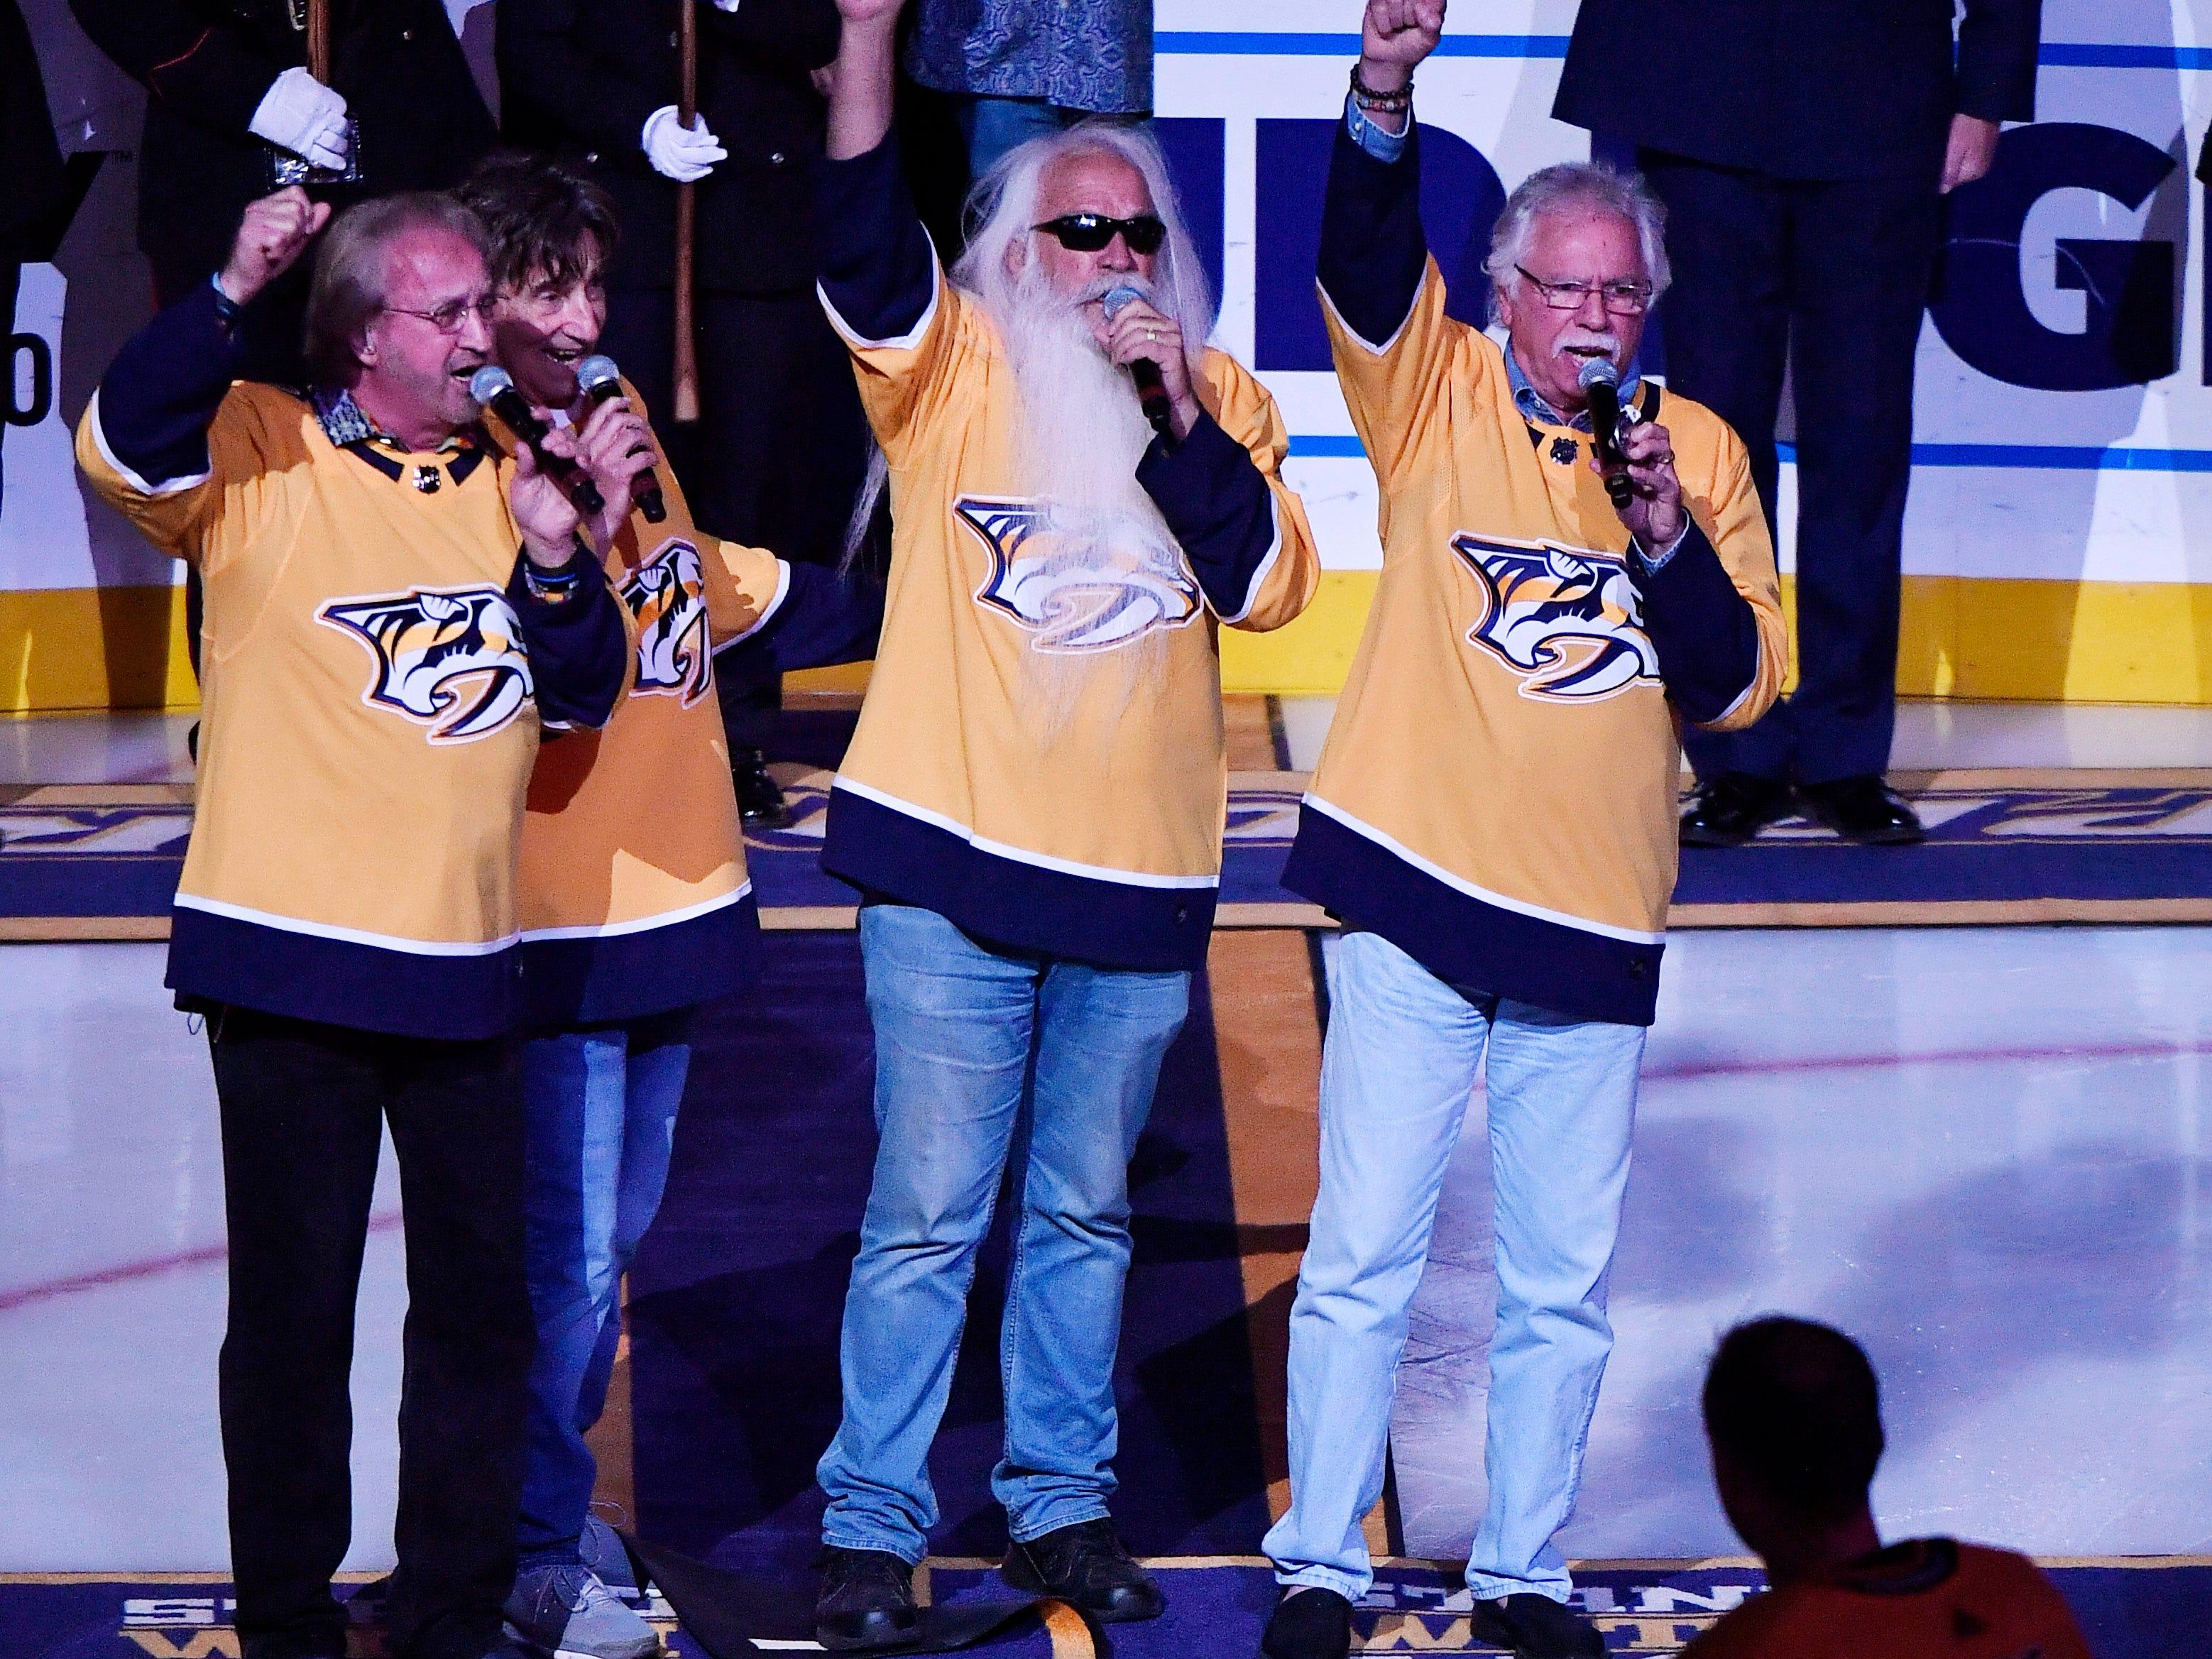 Nashville Predators goaltender Pekka Rinne (35) watches as the Oak Ridge Boys sing the National Anthem before the start of the home opener at Bridgestone Arena in Nashville, Tenn., Tuesday, Oct. 9, 2018.